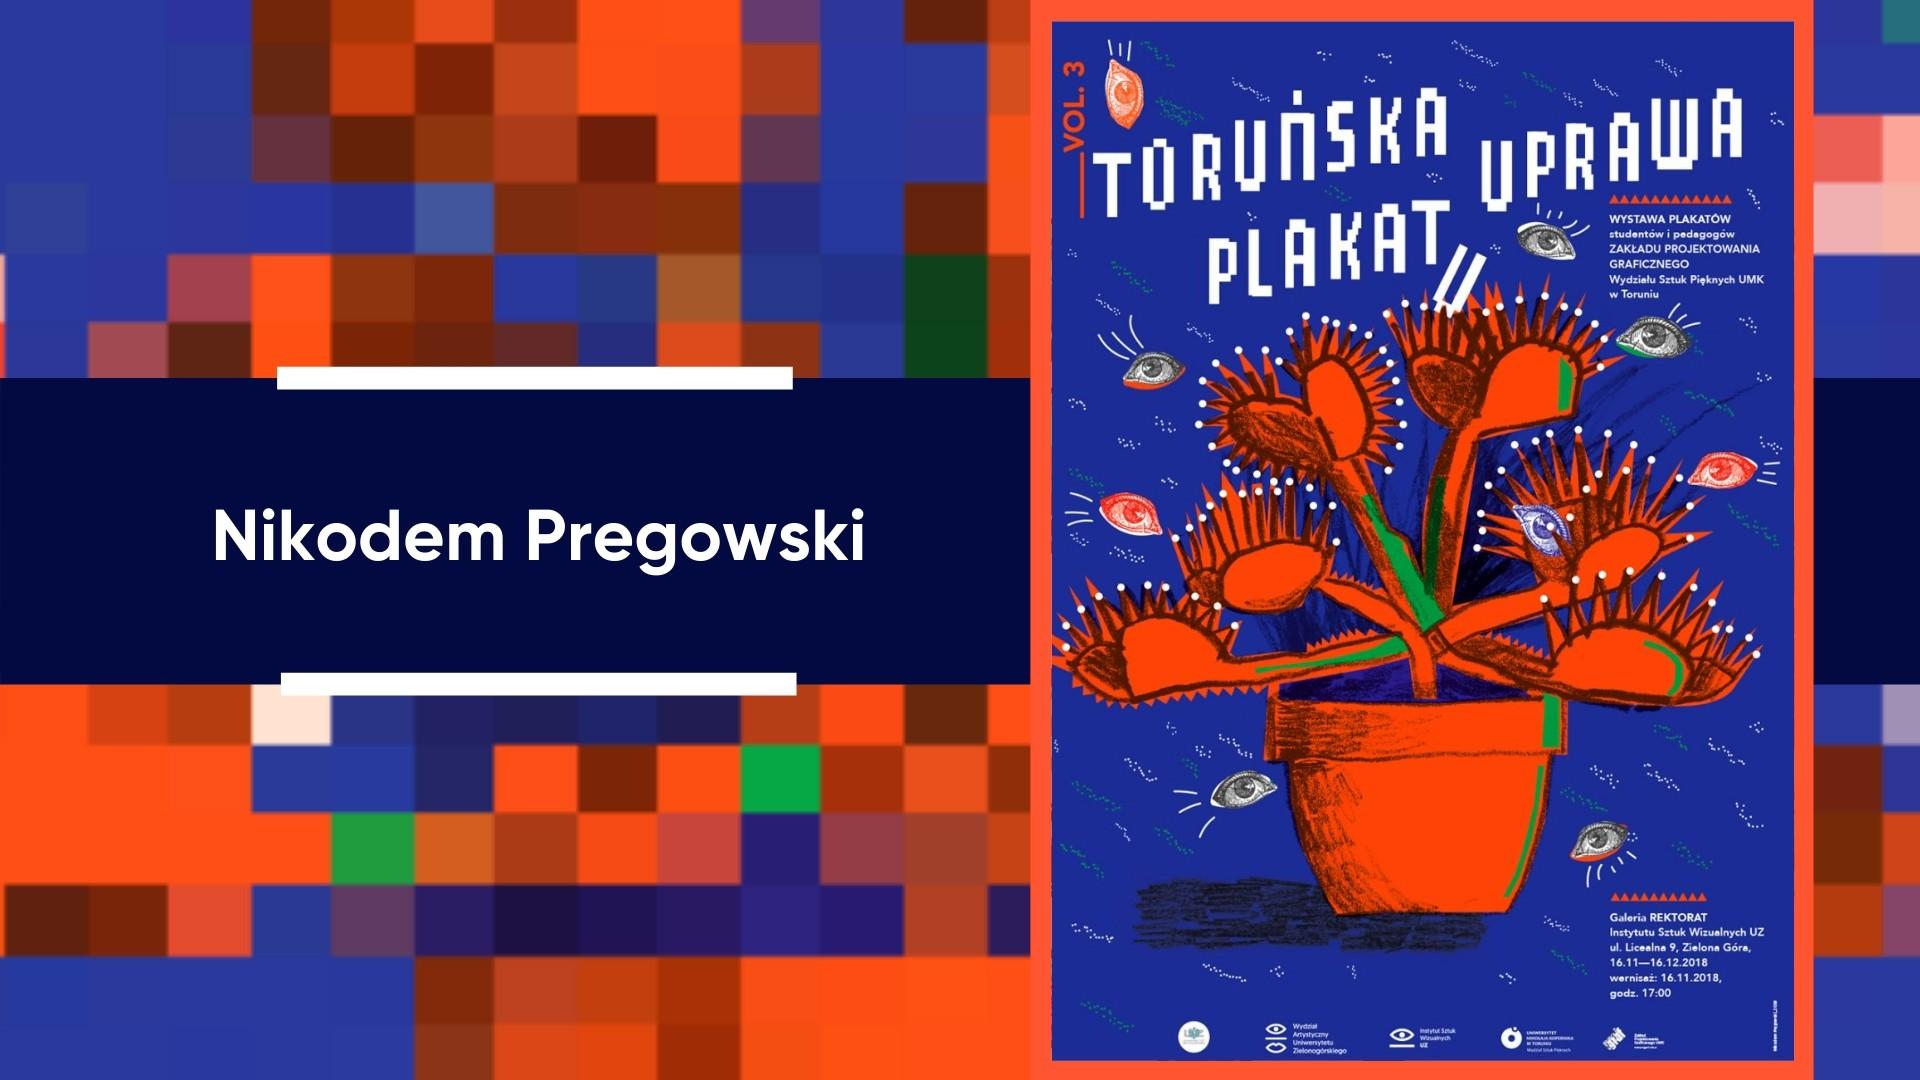 Фото: Nikodem Pregowski